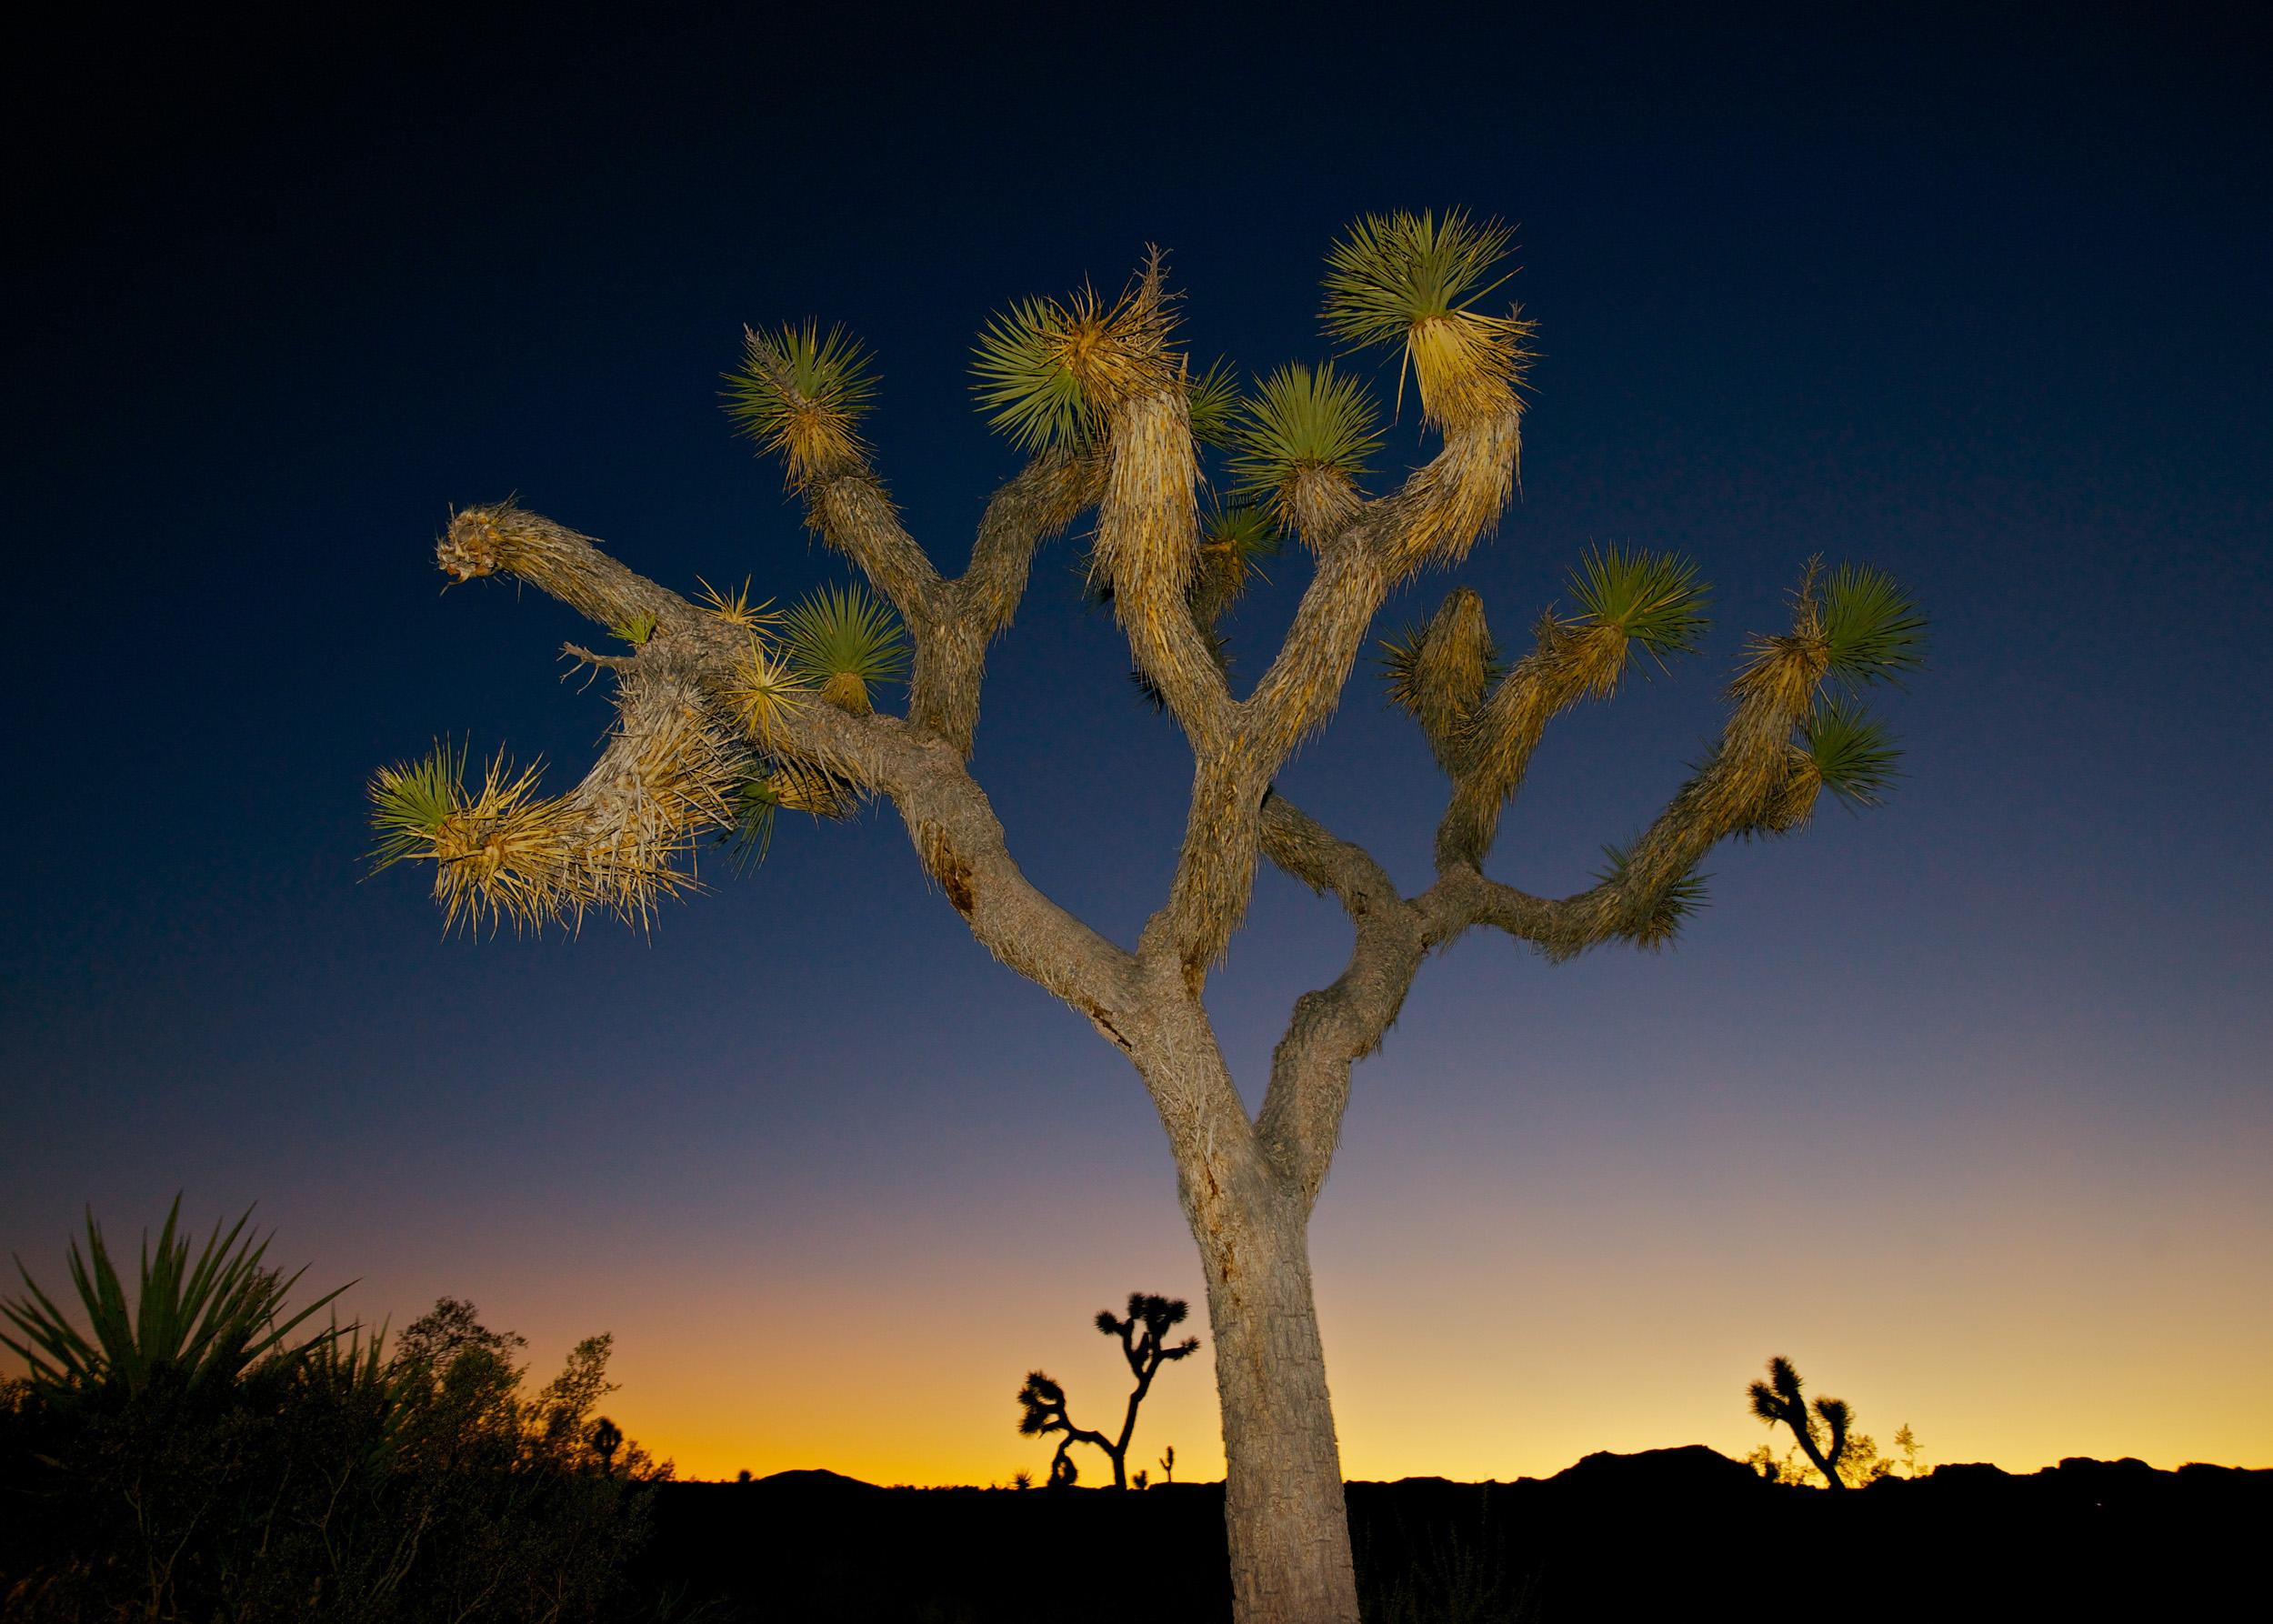 Joshua Tree National Park, CA, USA